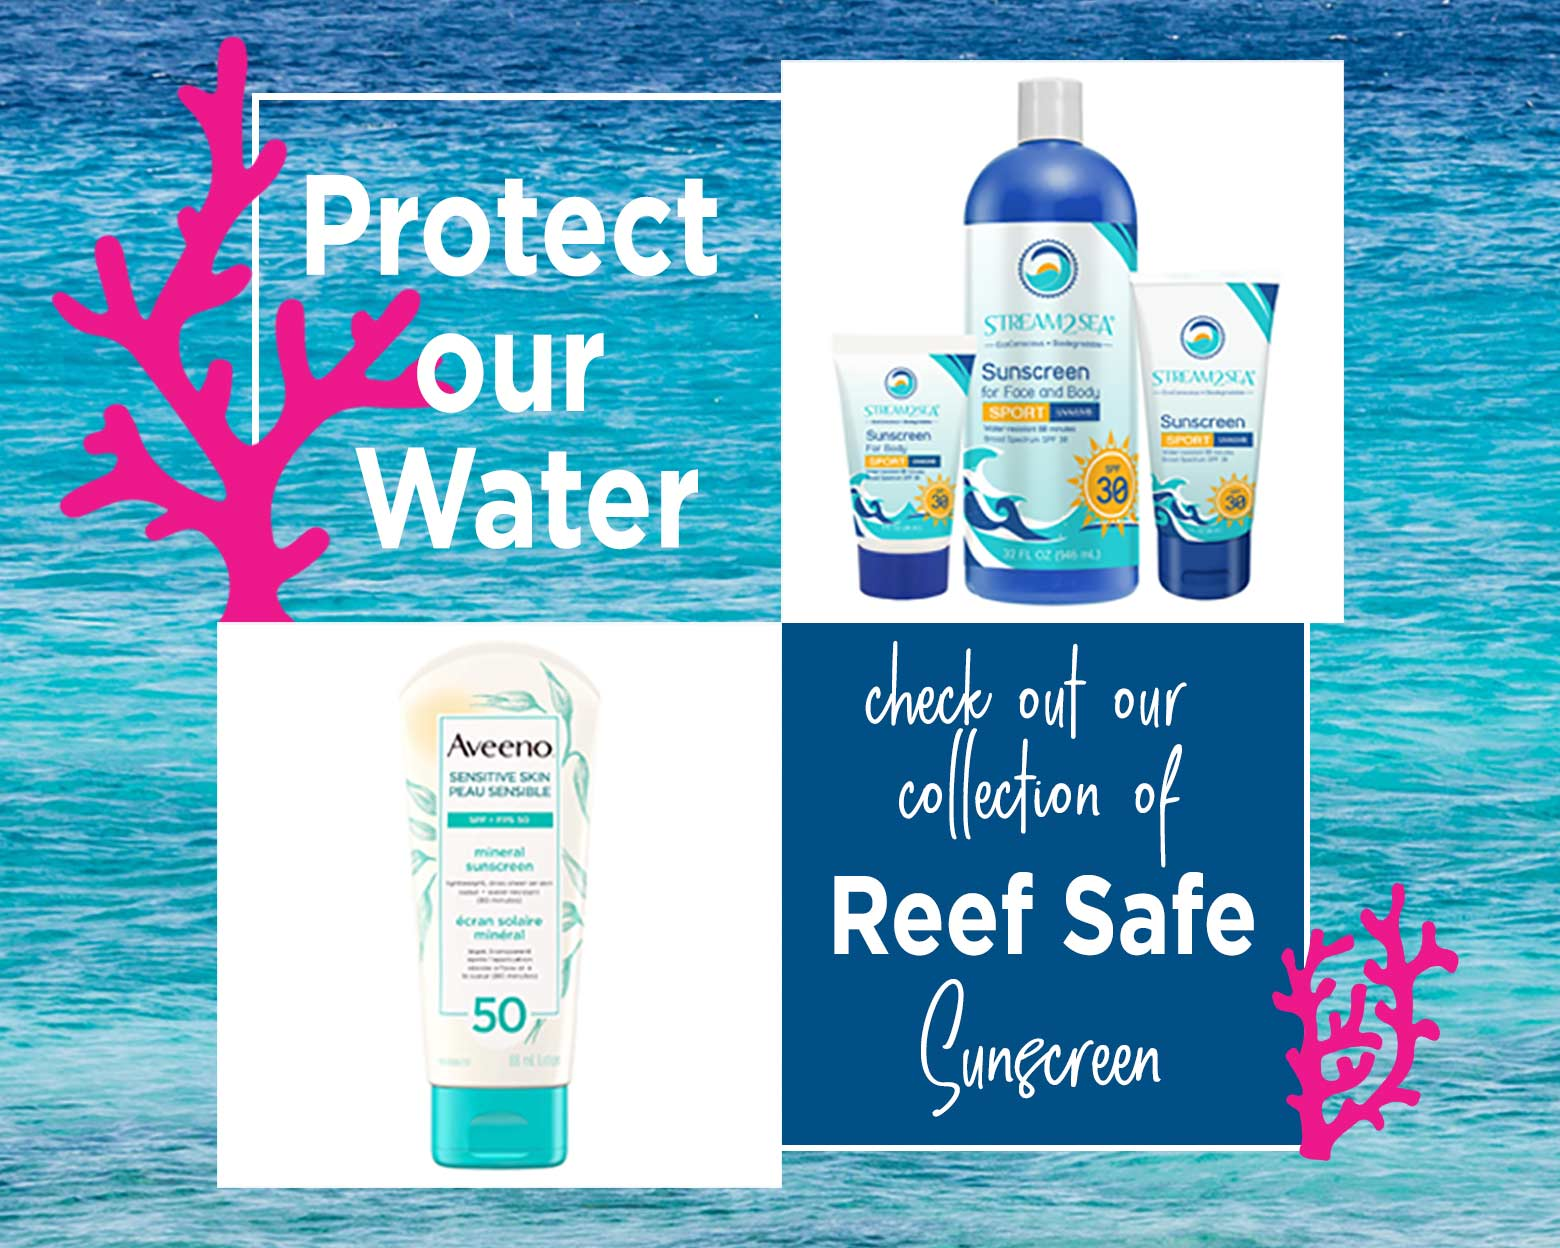 Reef Safe Sunscreen Shop Ad